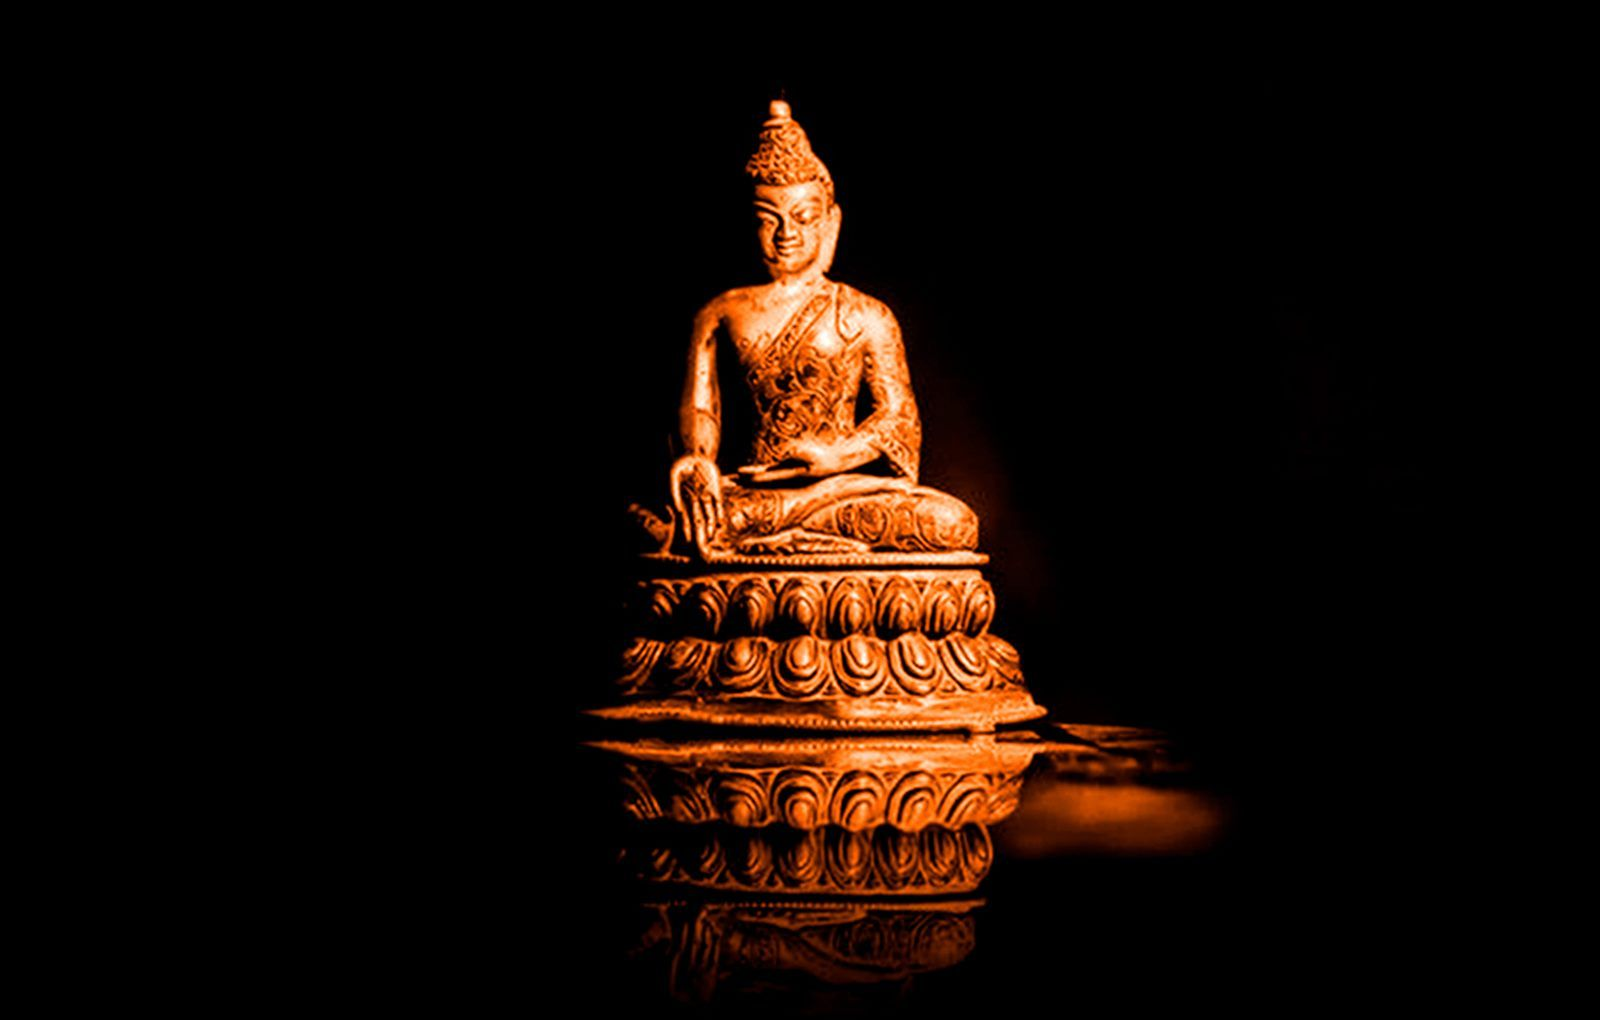 Black Buddha Wallpapers Top Free Black Buddha Backgrounds Wallpaperaccess